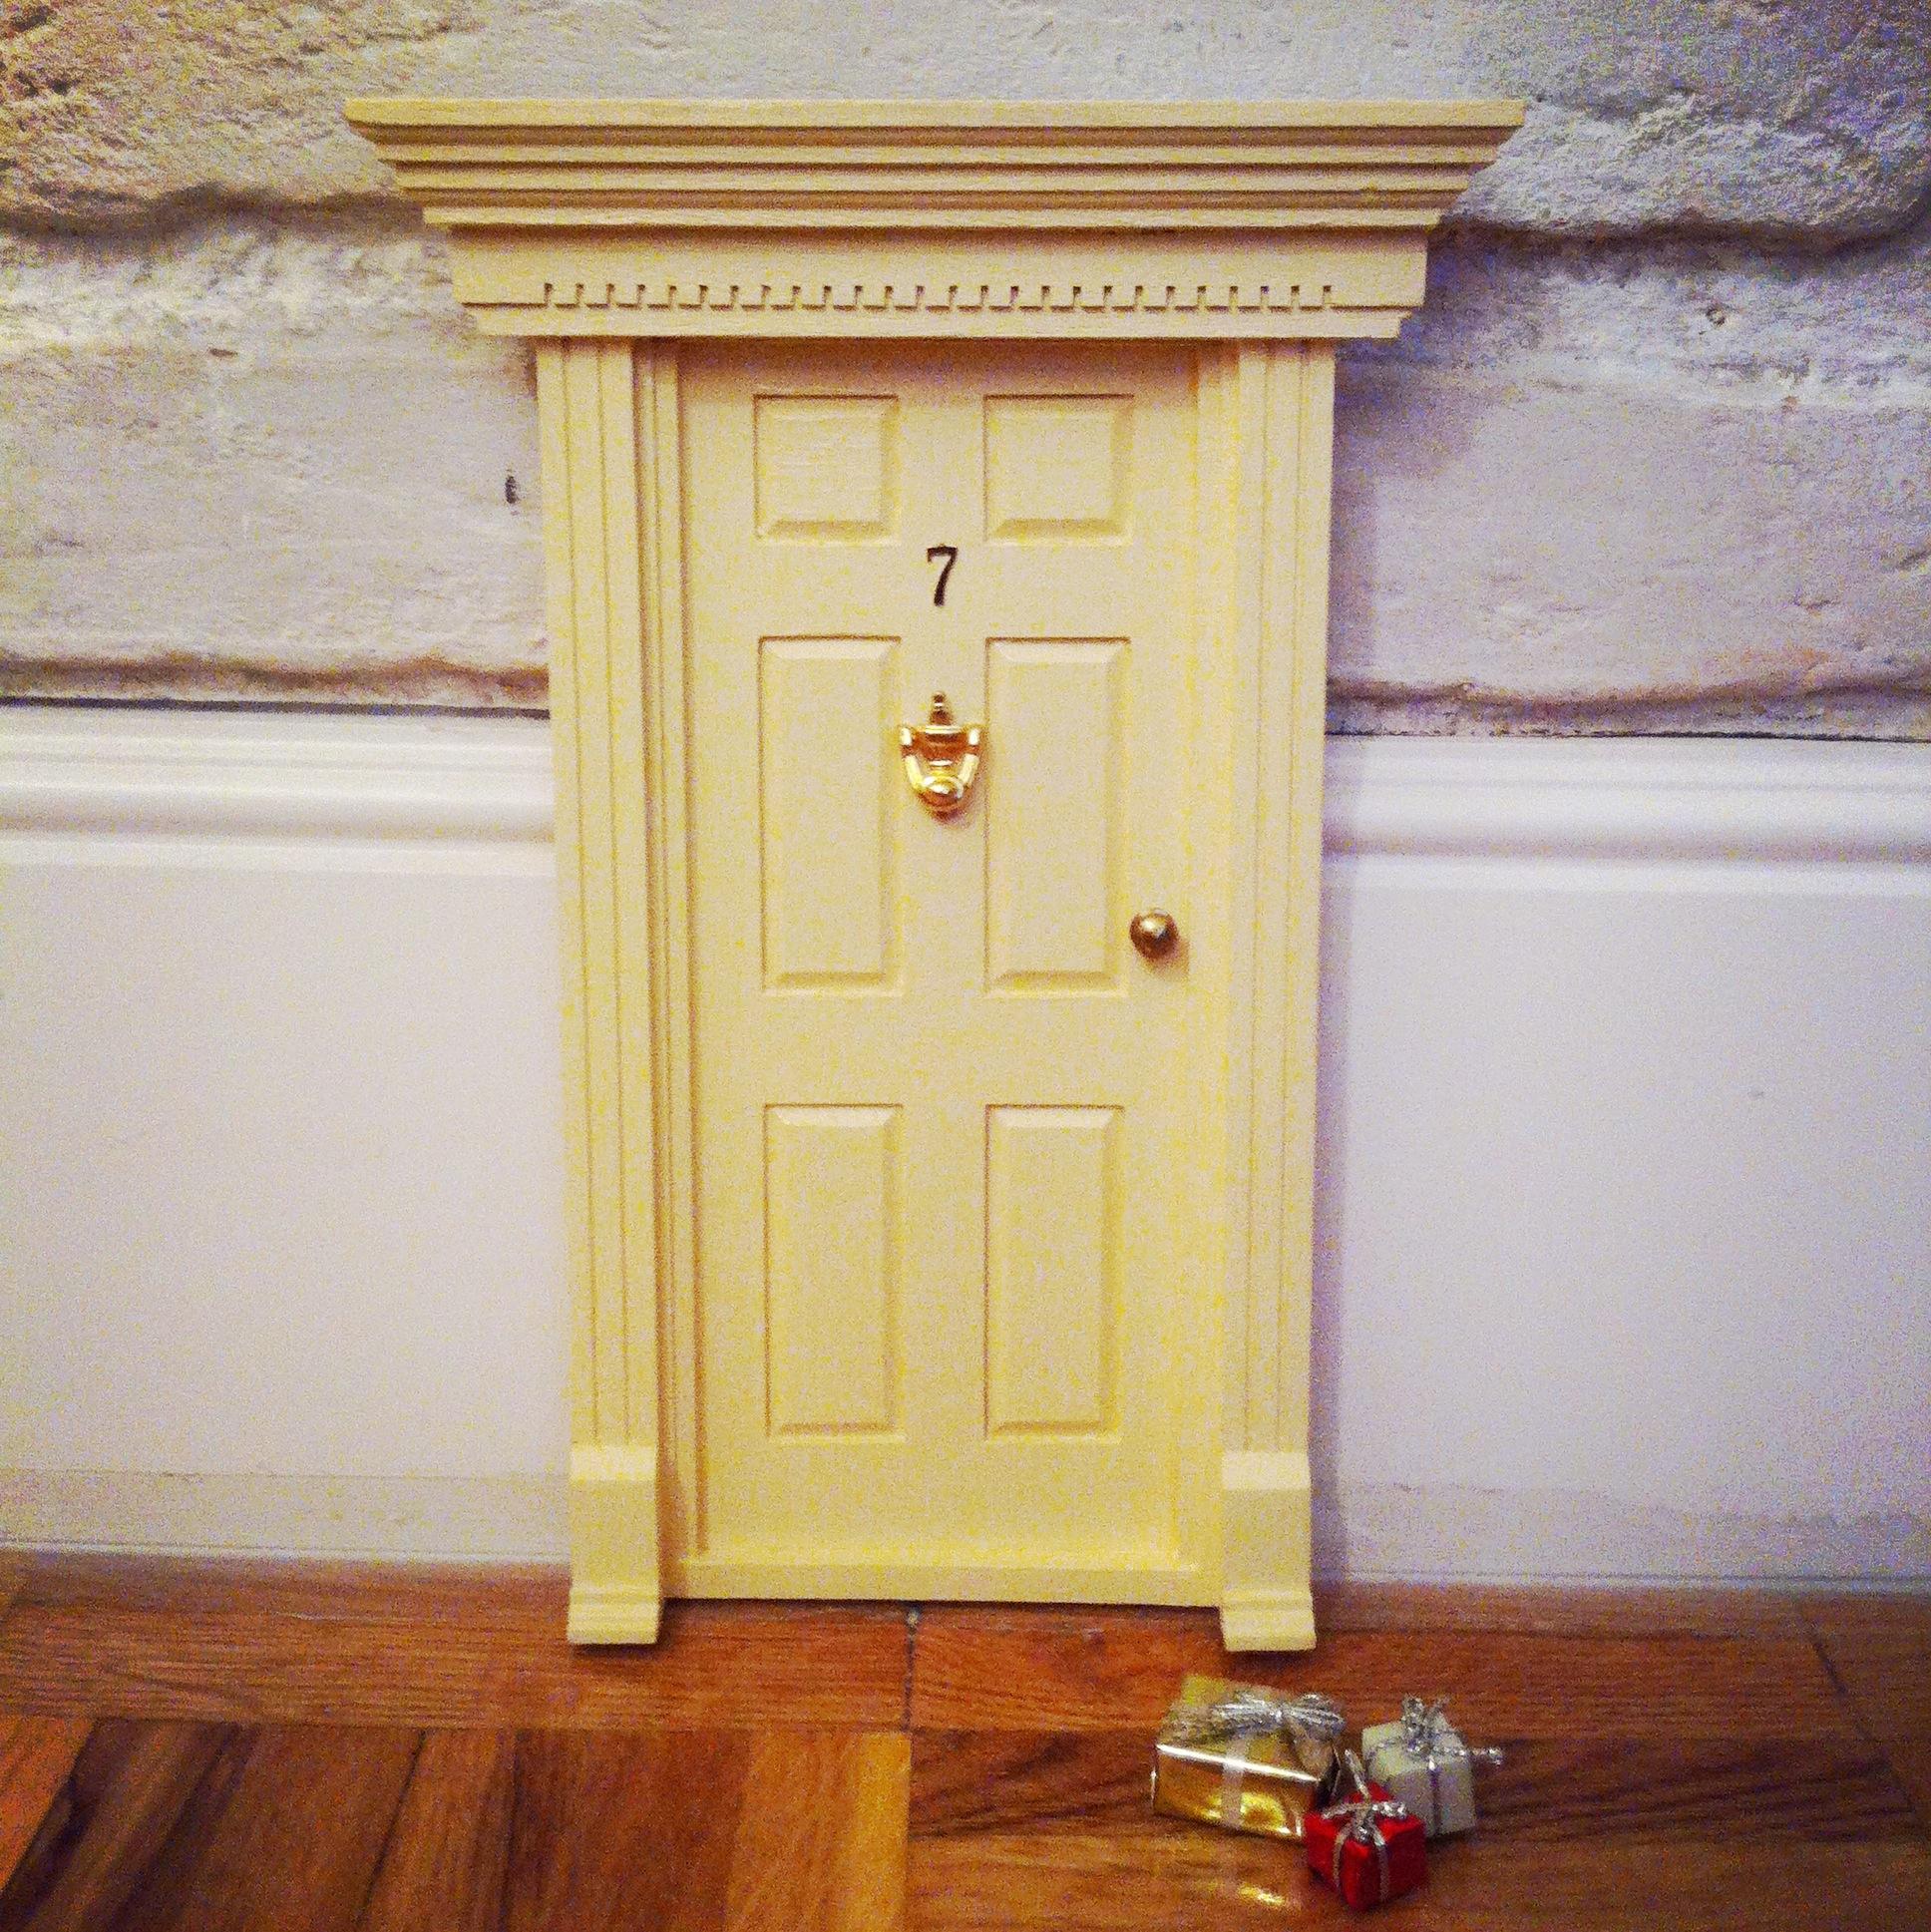 Oui Oui-puerta ratoncito pérez-regalo original niños-crema estilo inglés